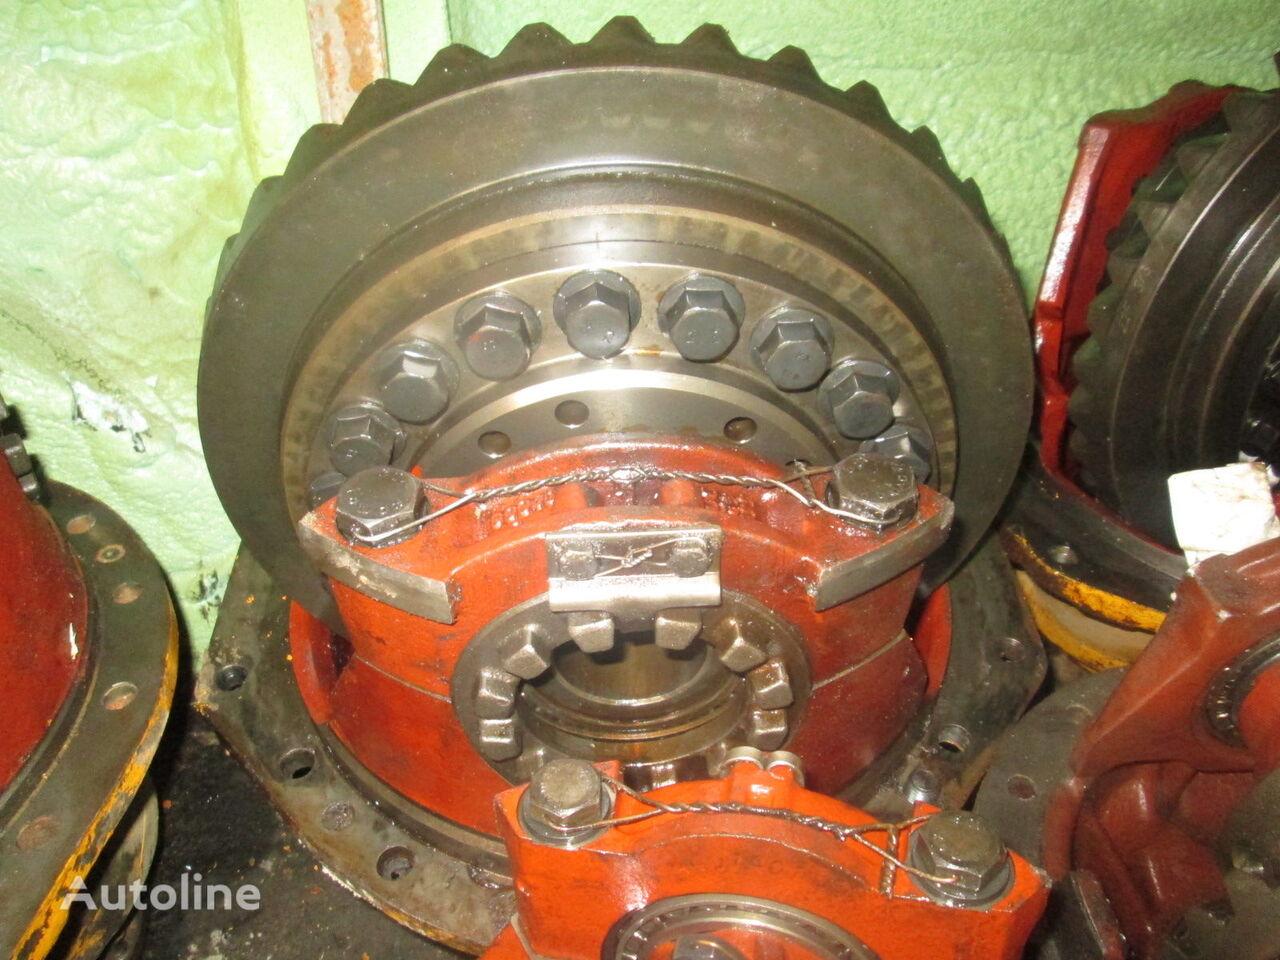 diferensial ZF 4460 325 026 ZP 9:37 untuk wheel loader